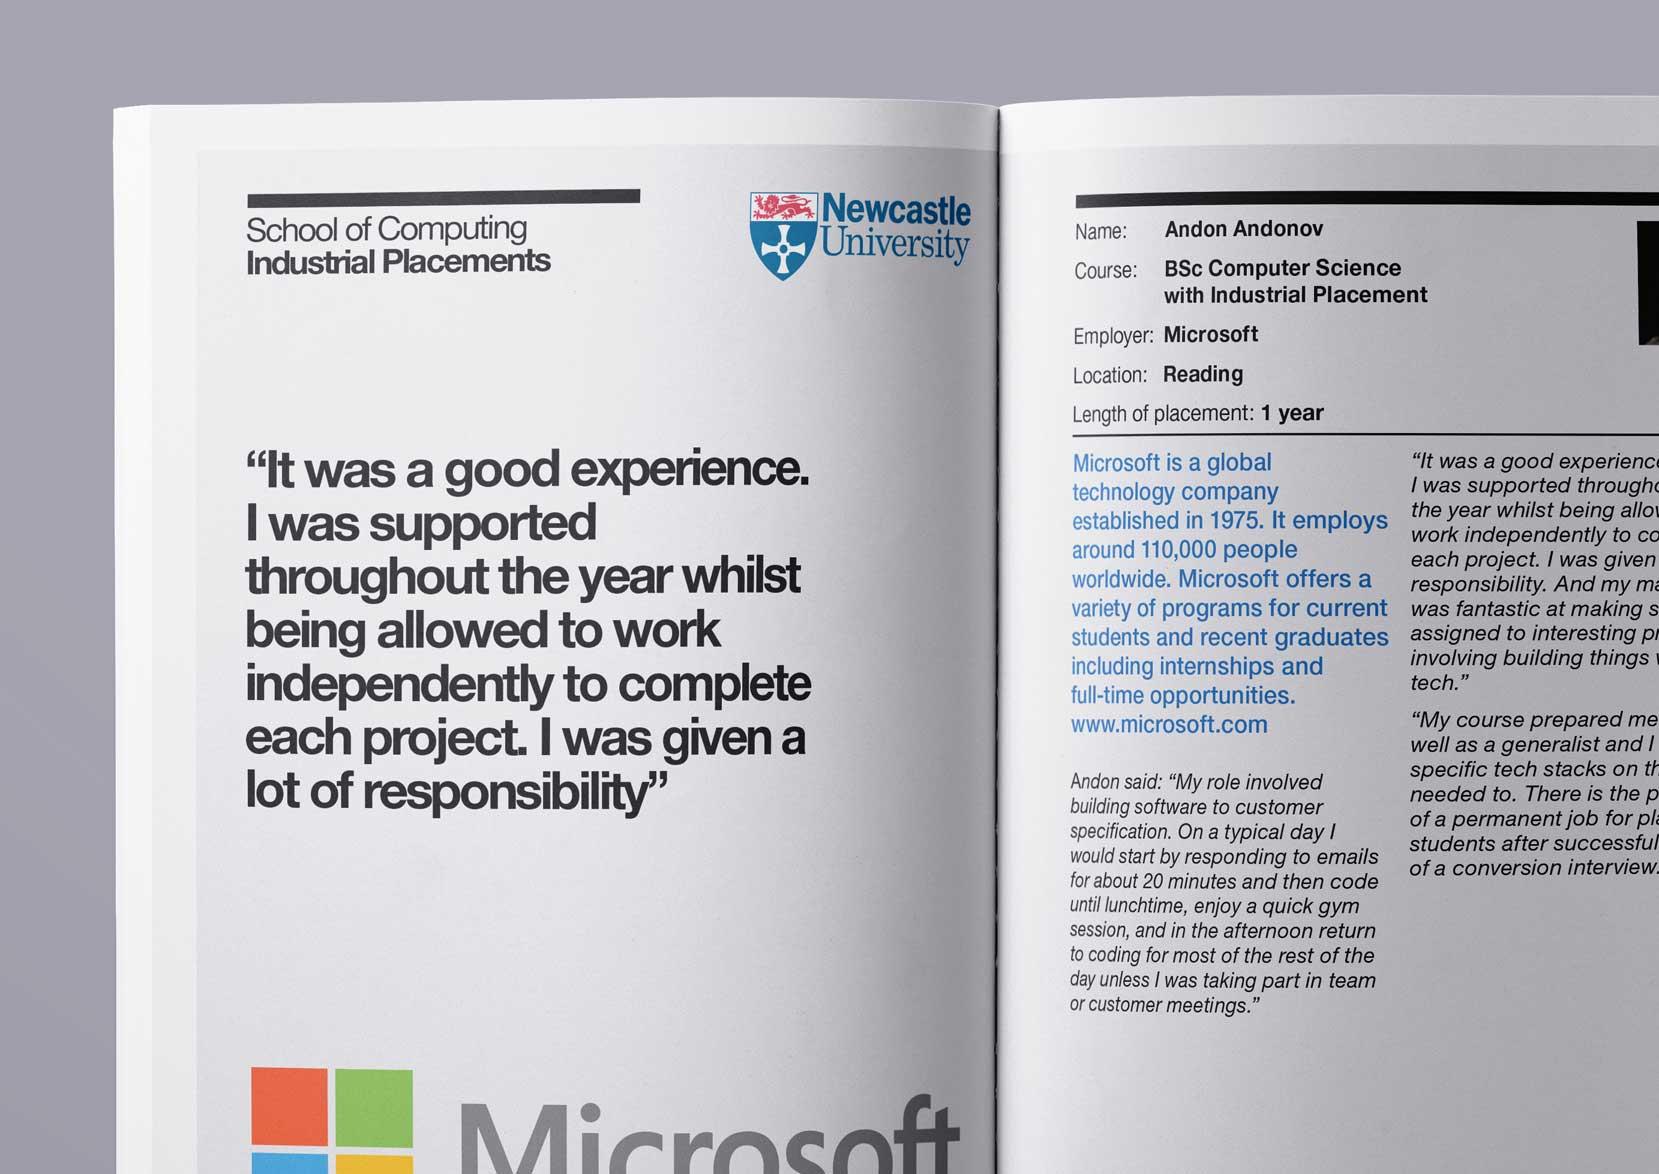 Newcastle_University_Computer_Science1_richardbudddesign.jpg